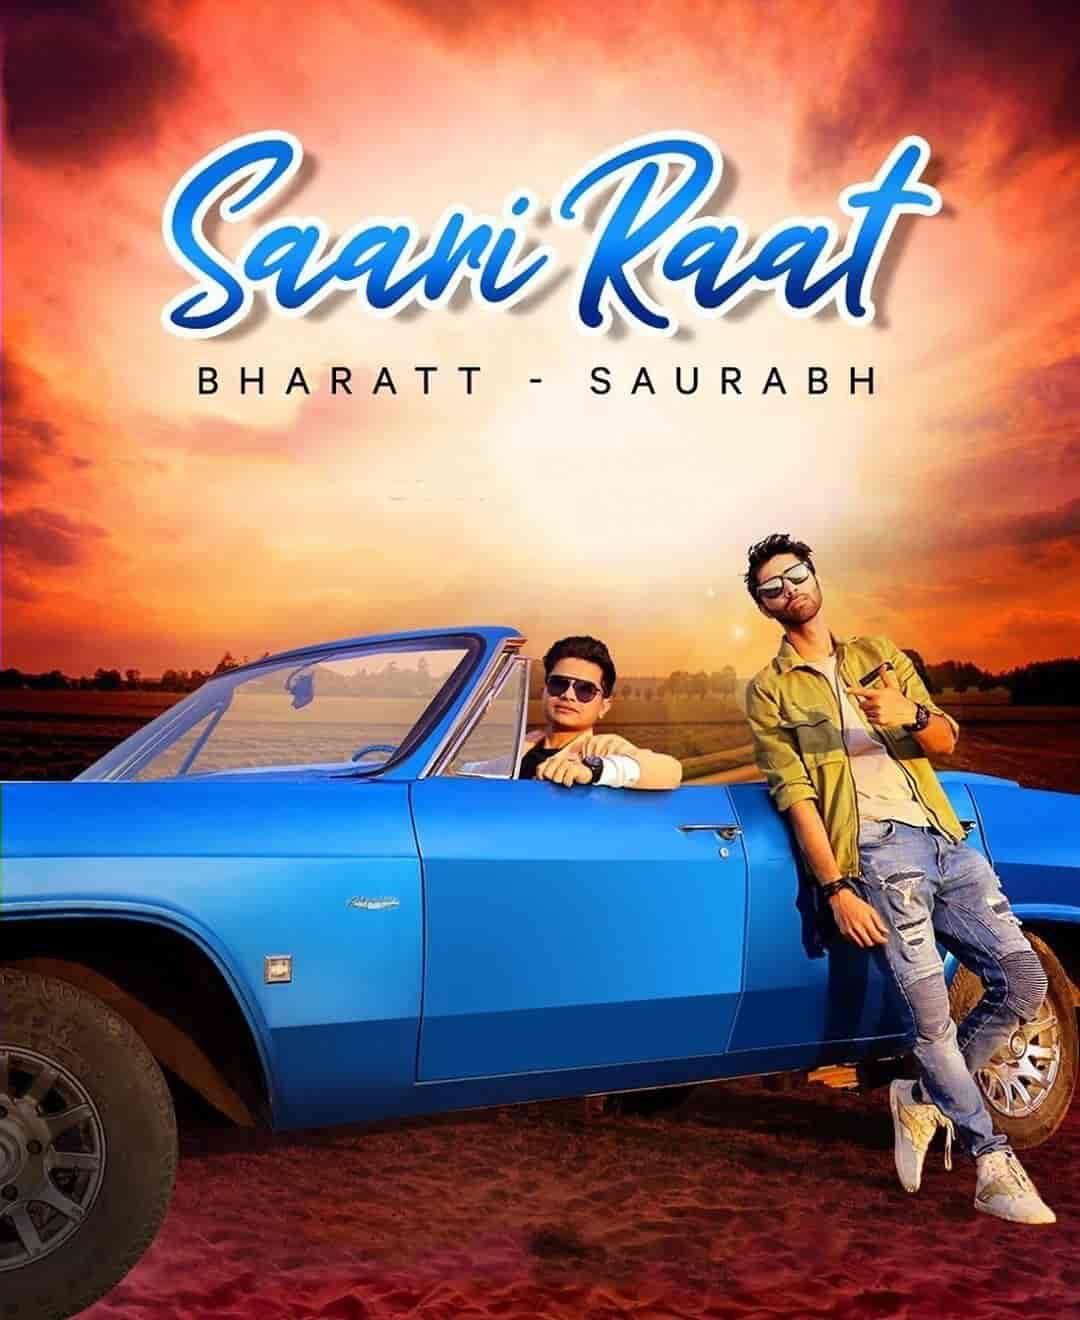 Saari Raat Song Images By Bharatt Saurabh